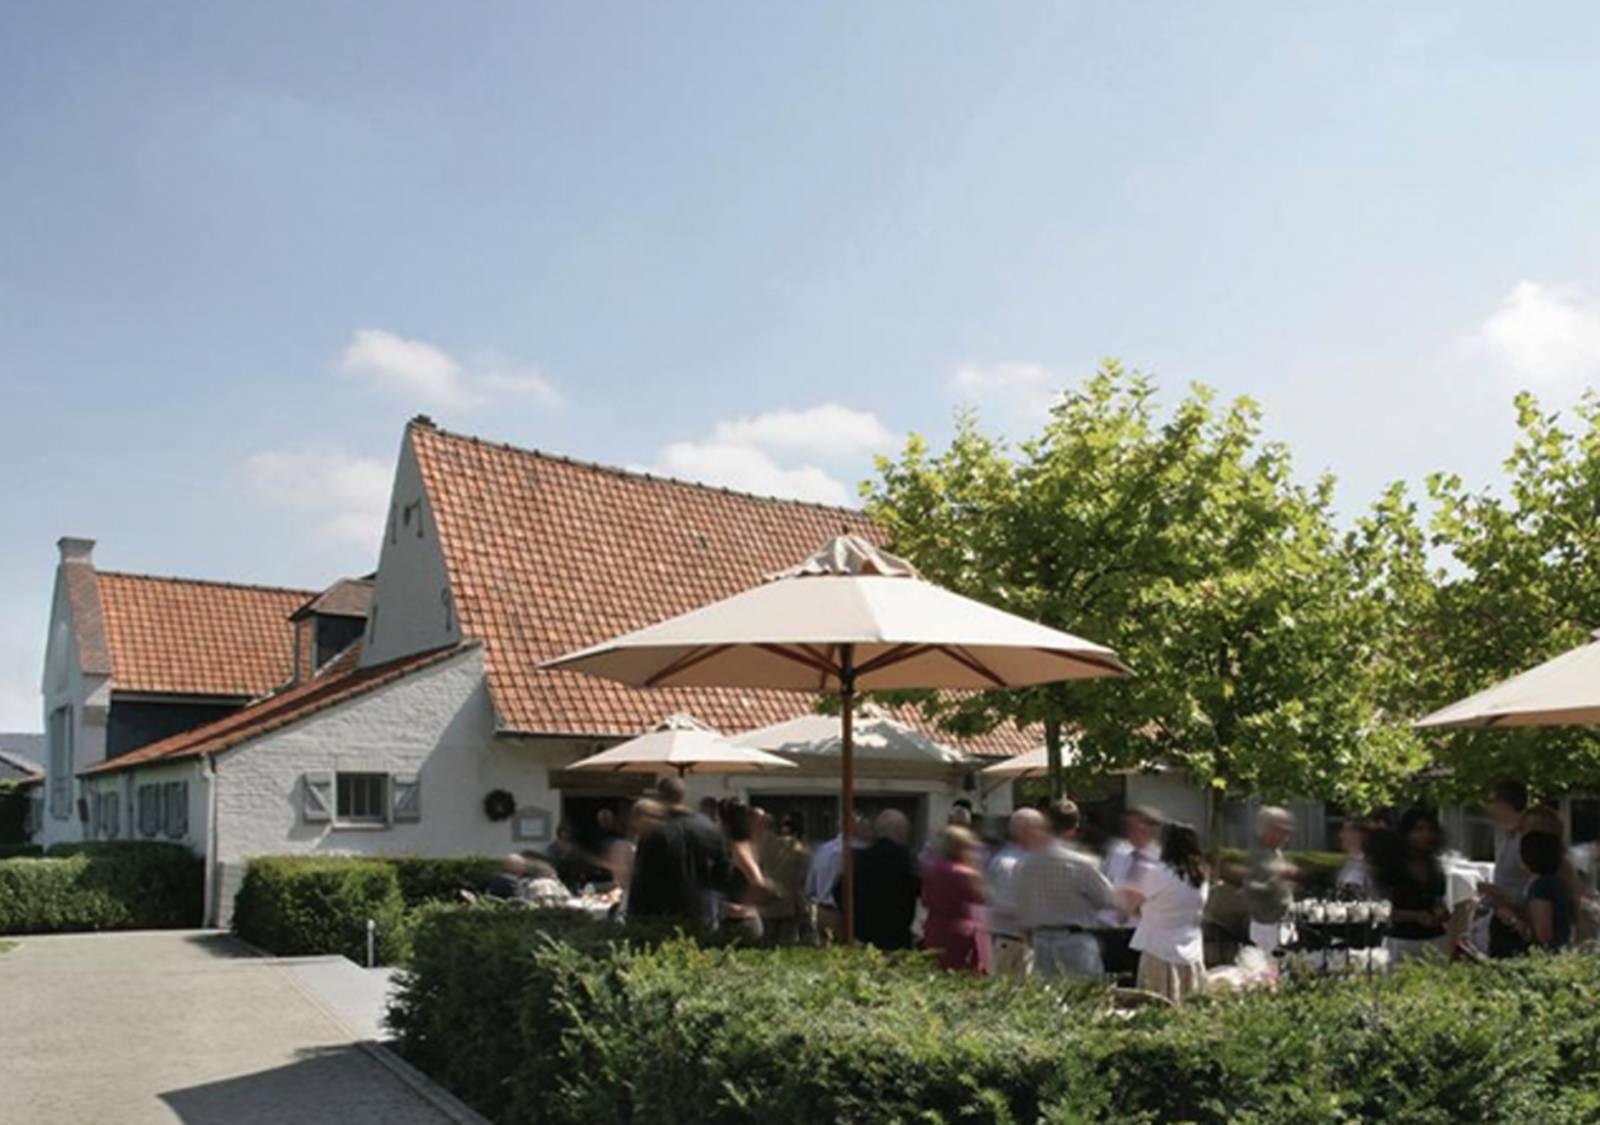 Feestzaal - Klokhof - House of Events(28)